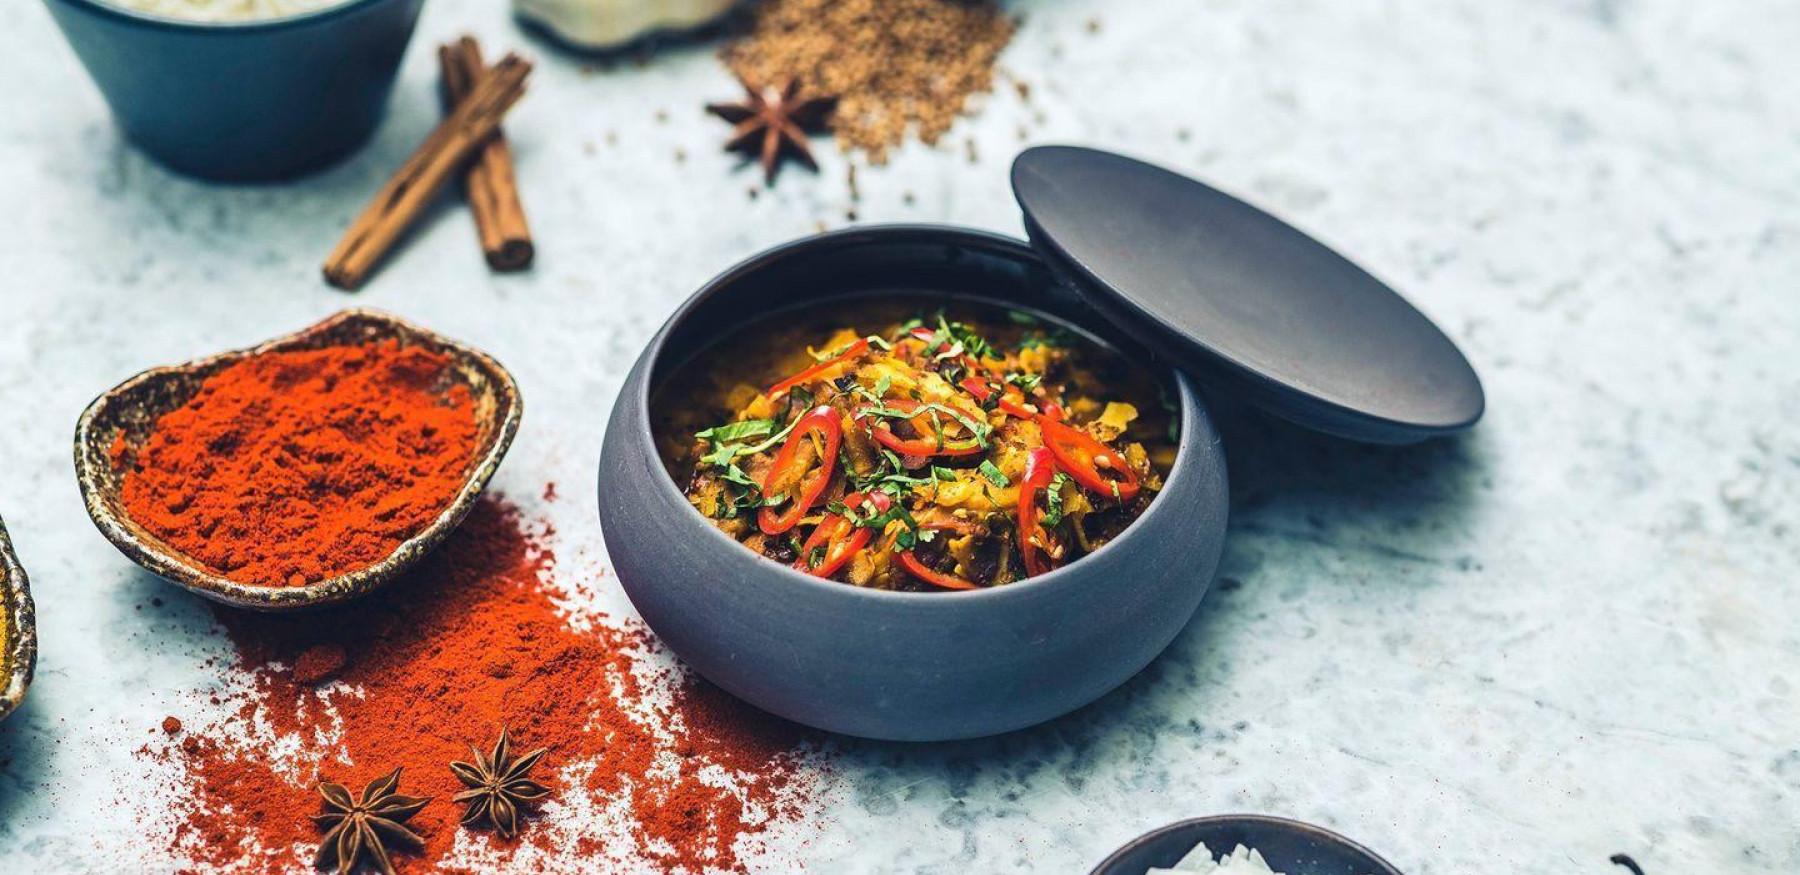 A taste of india photo 1 698531259